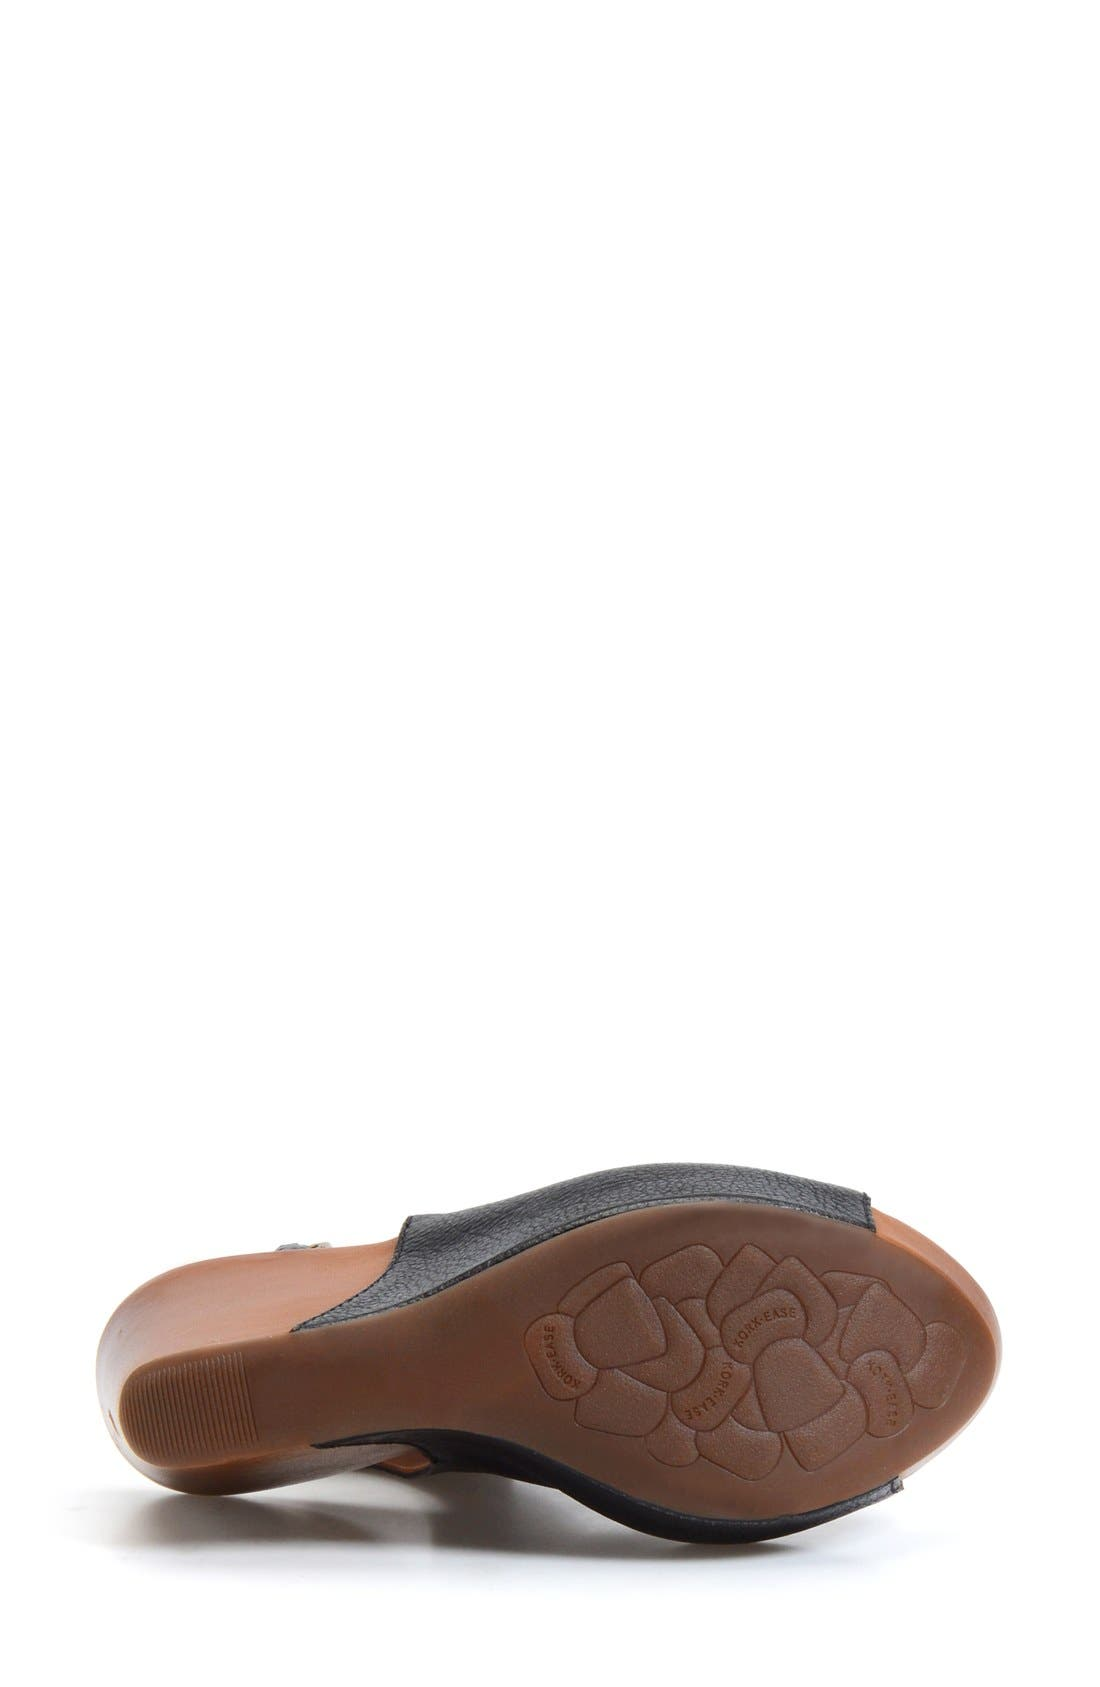 'Berit' Wedge Sandal,                             Alternate thumbnail 75, color,